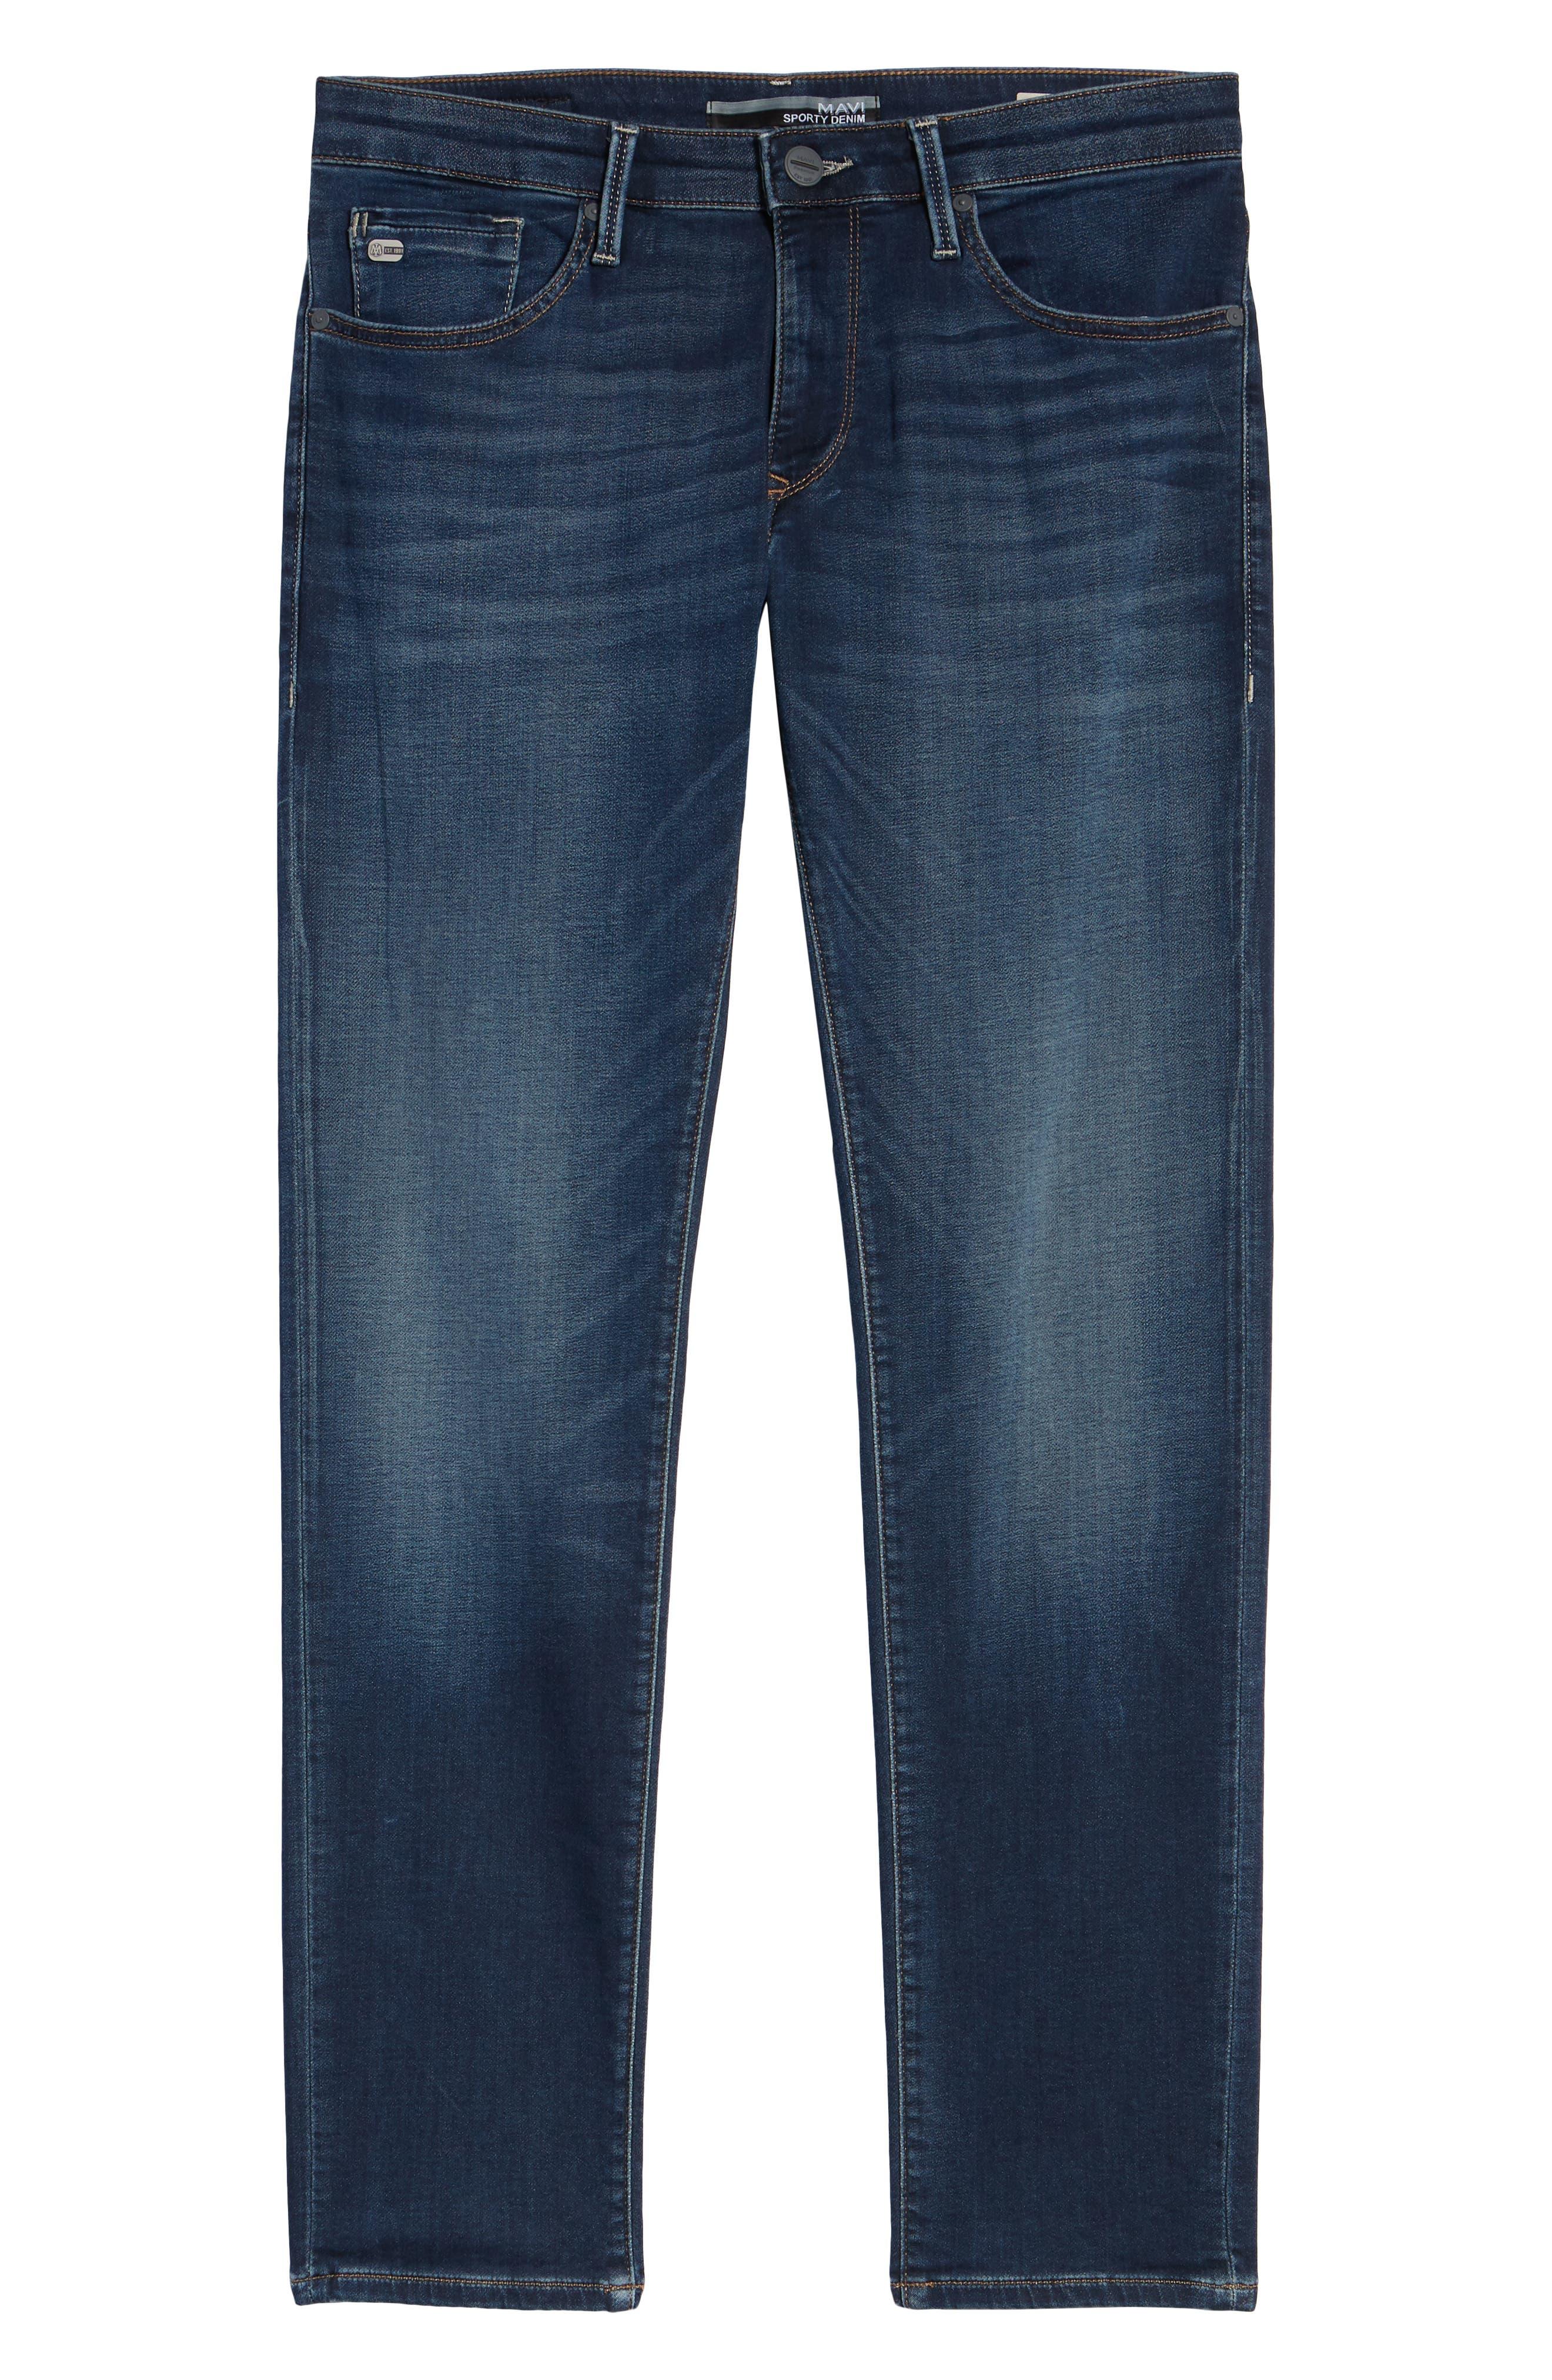 Jake Slim Fit Jeans,                             Alternate thumbnail 6, color,                             DARK SPORTY